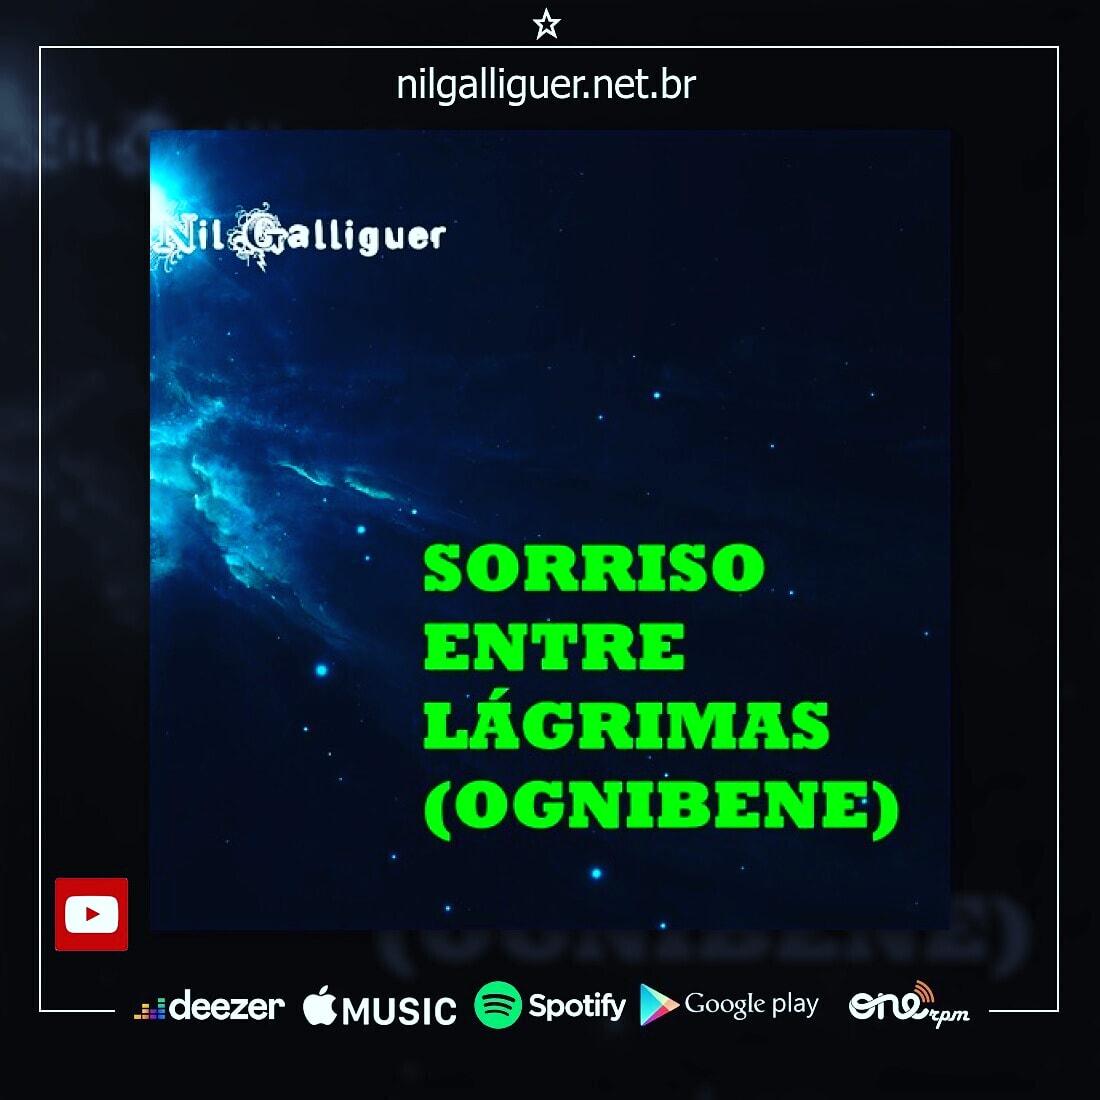 Nil Galliguer - Sorriso entre Lágrimas (Ognibene) [Lançamento 2021]